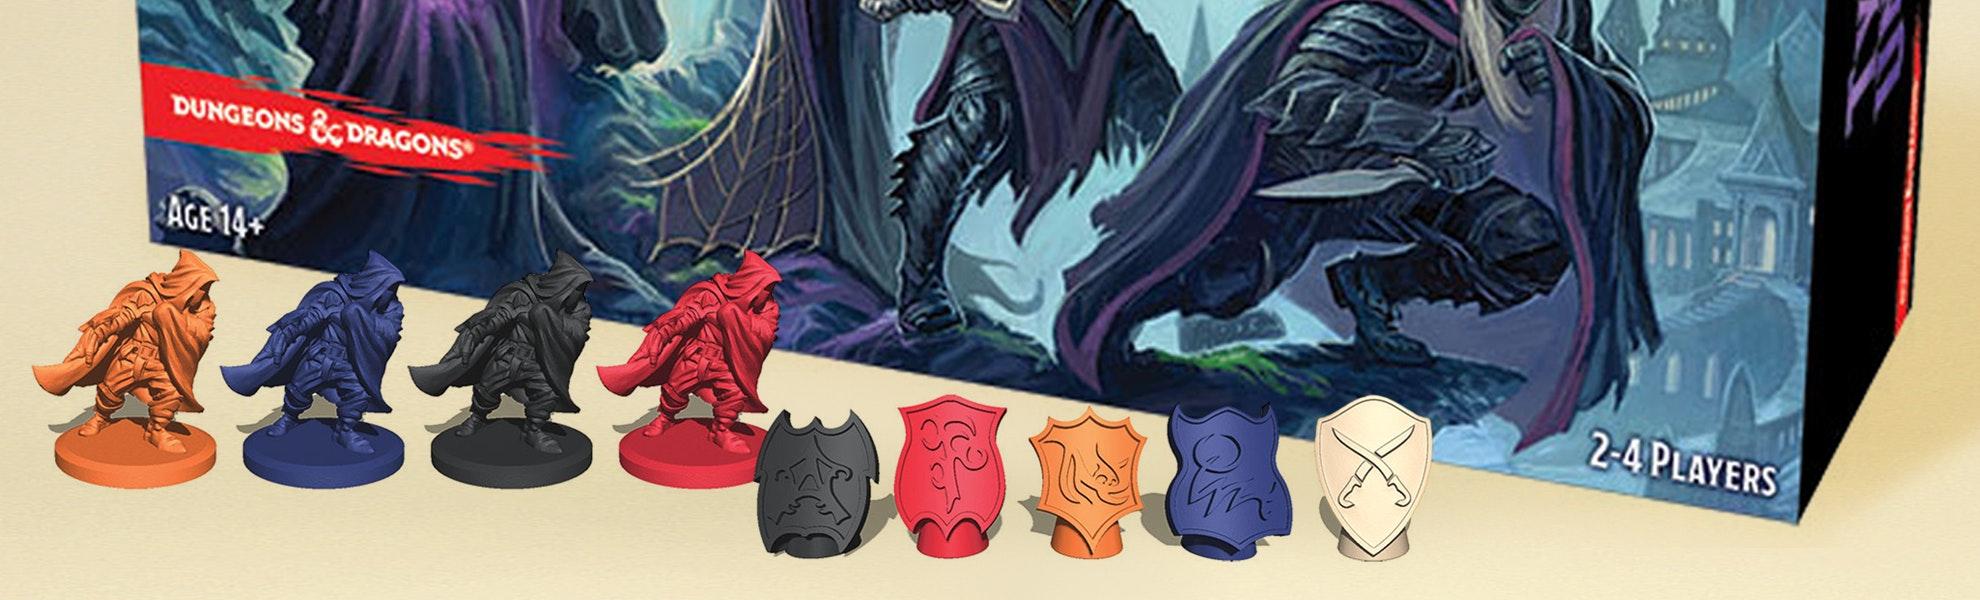 Dungeons & Dragons: Tyrants of the Underdark